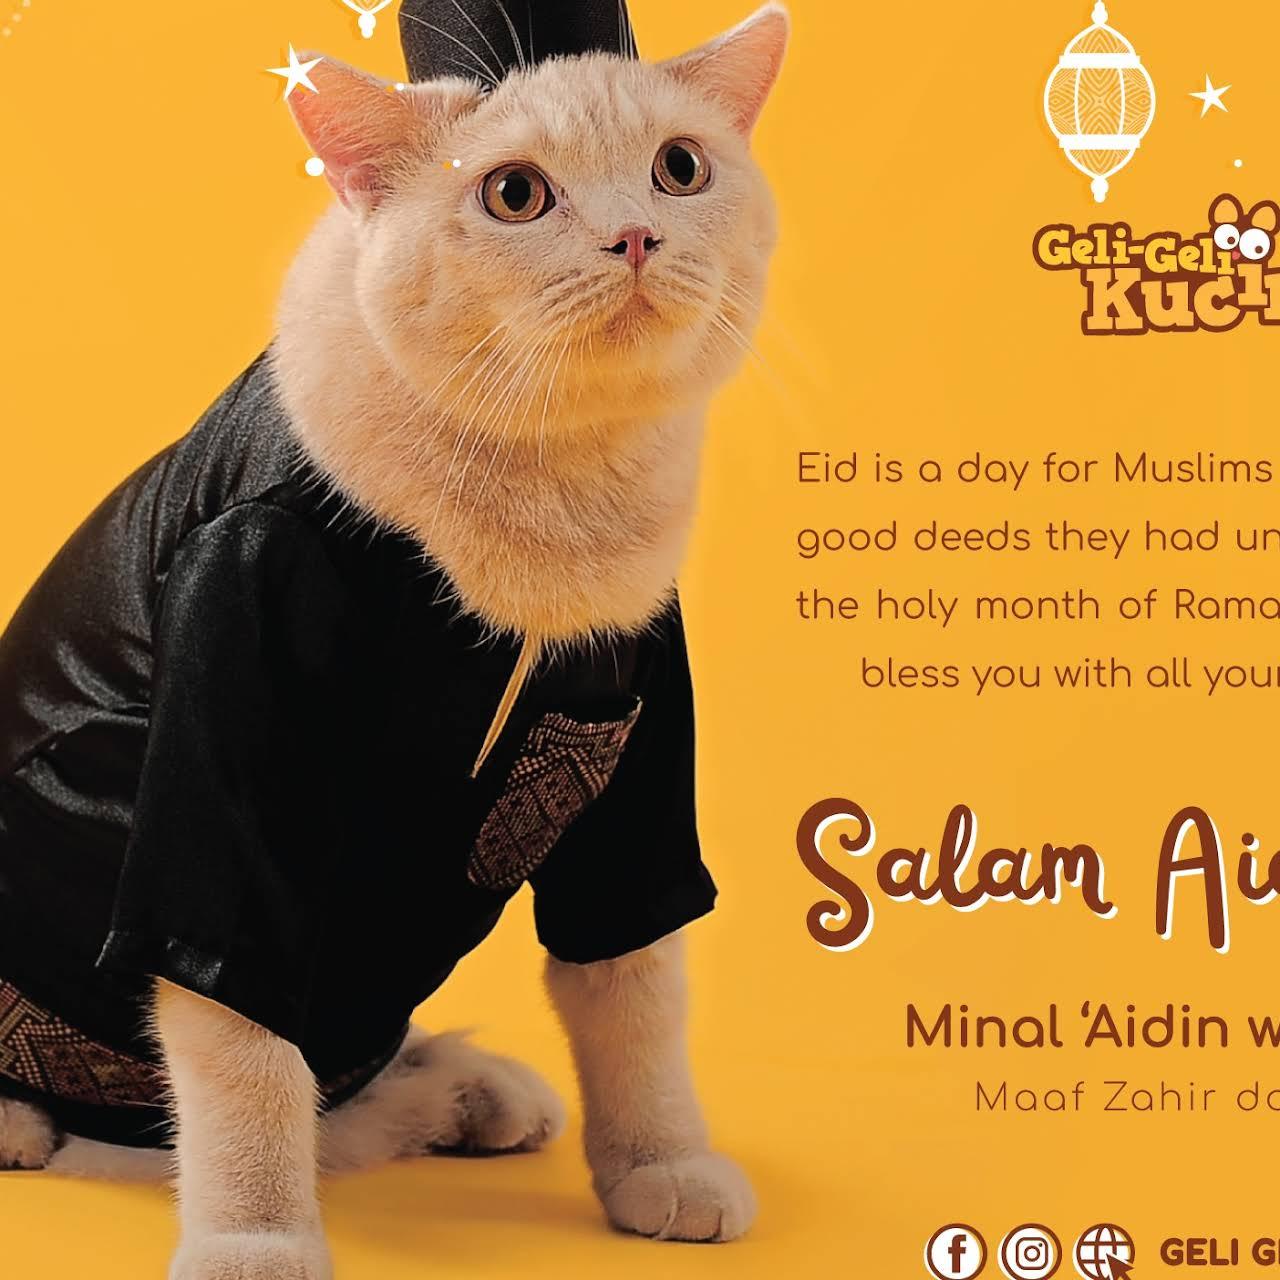 Geli Geli Kucing Kuala Kangsar Pet Shop Kuala Kangsar Branch